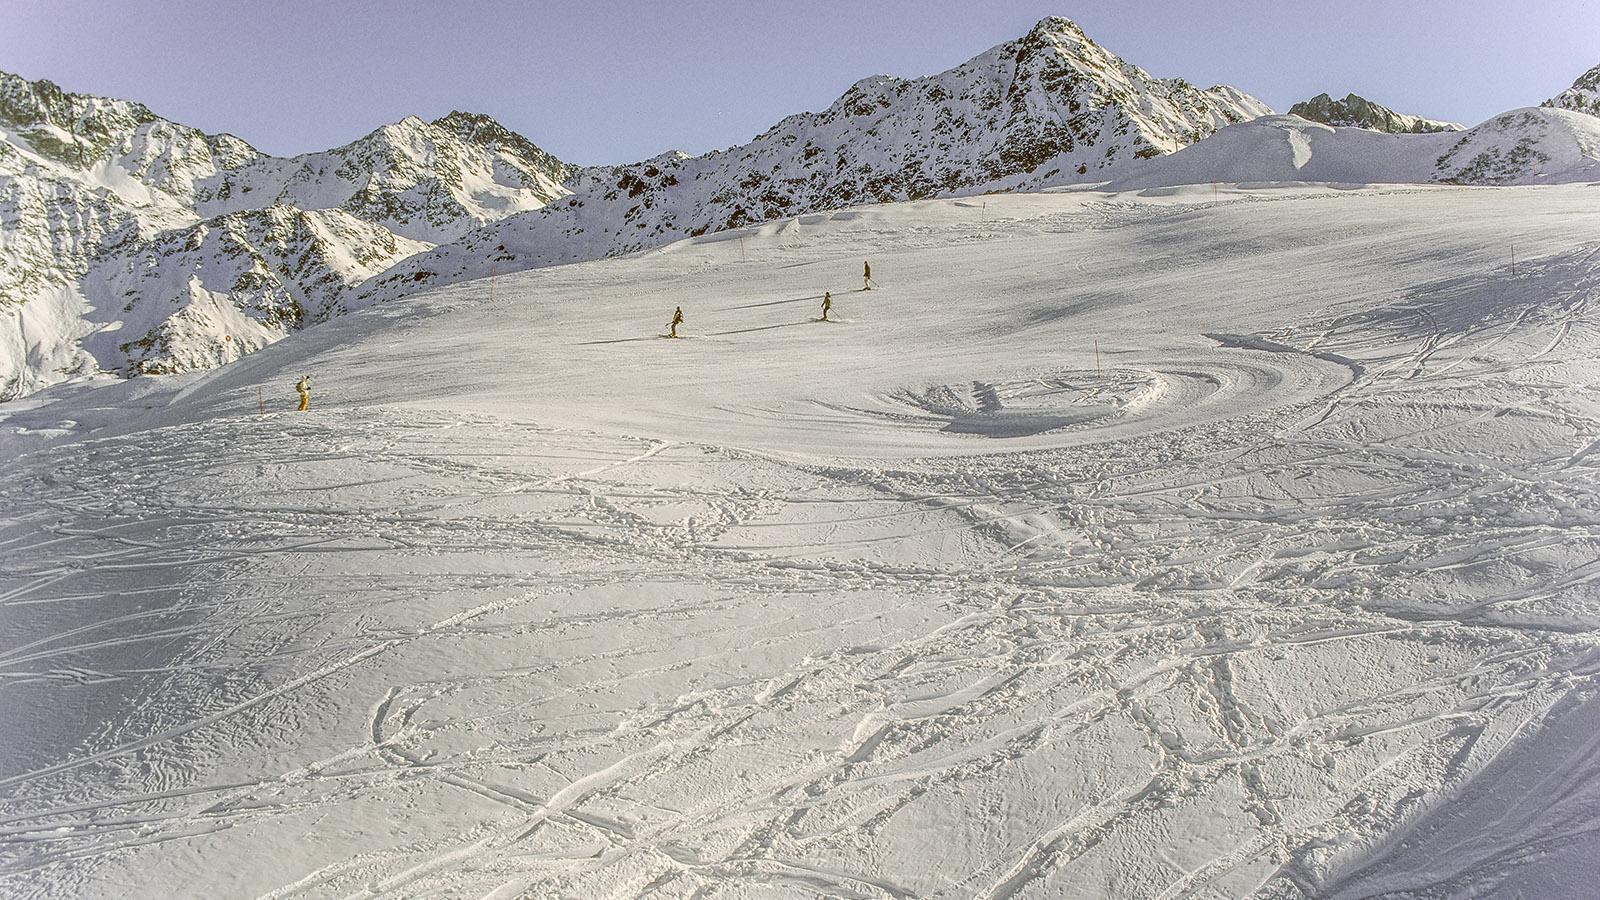 Les Contamines-Montjoie, Skiegebiet. Foto: Hilke Maunder